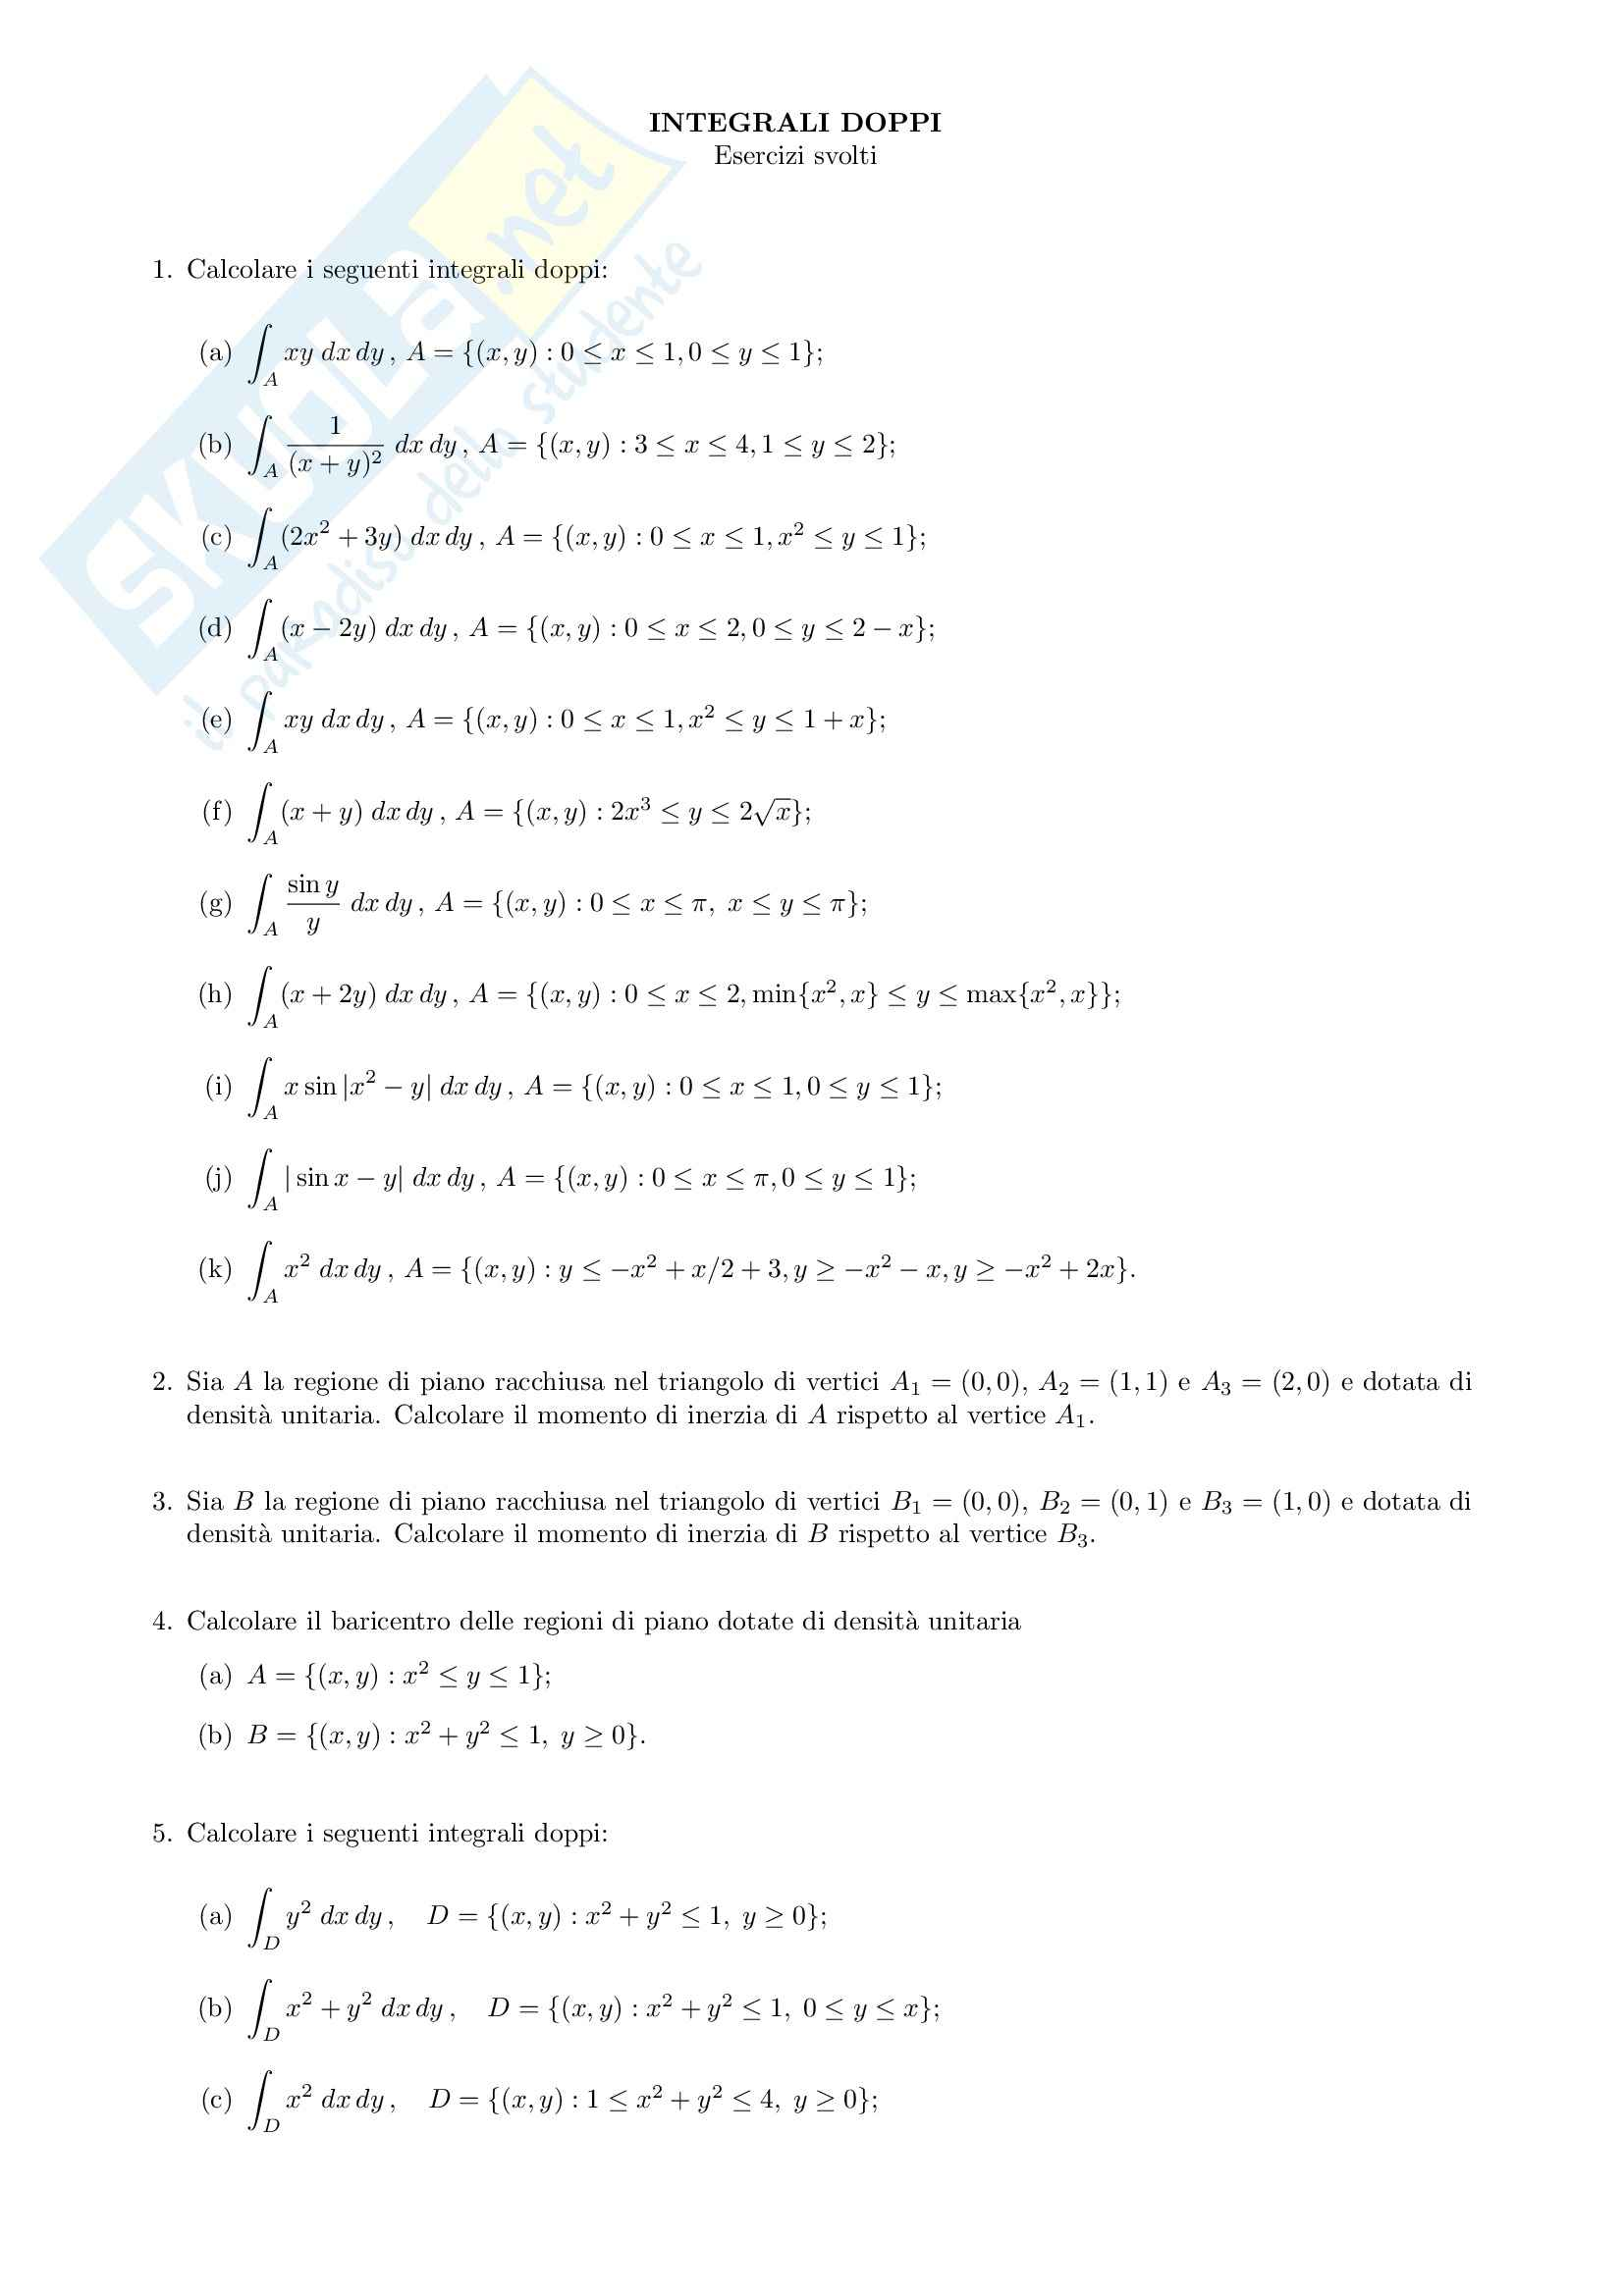 integrali matematica  Analisi matematica II - integrali doppi - Esercizi